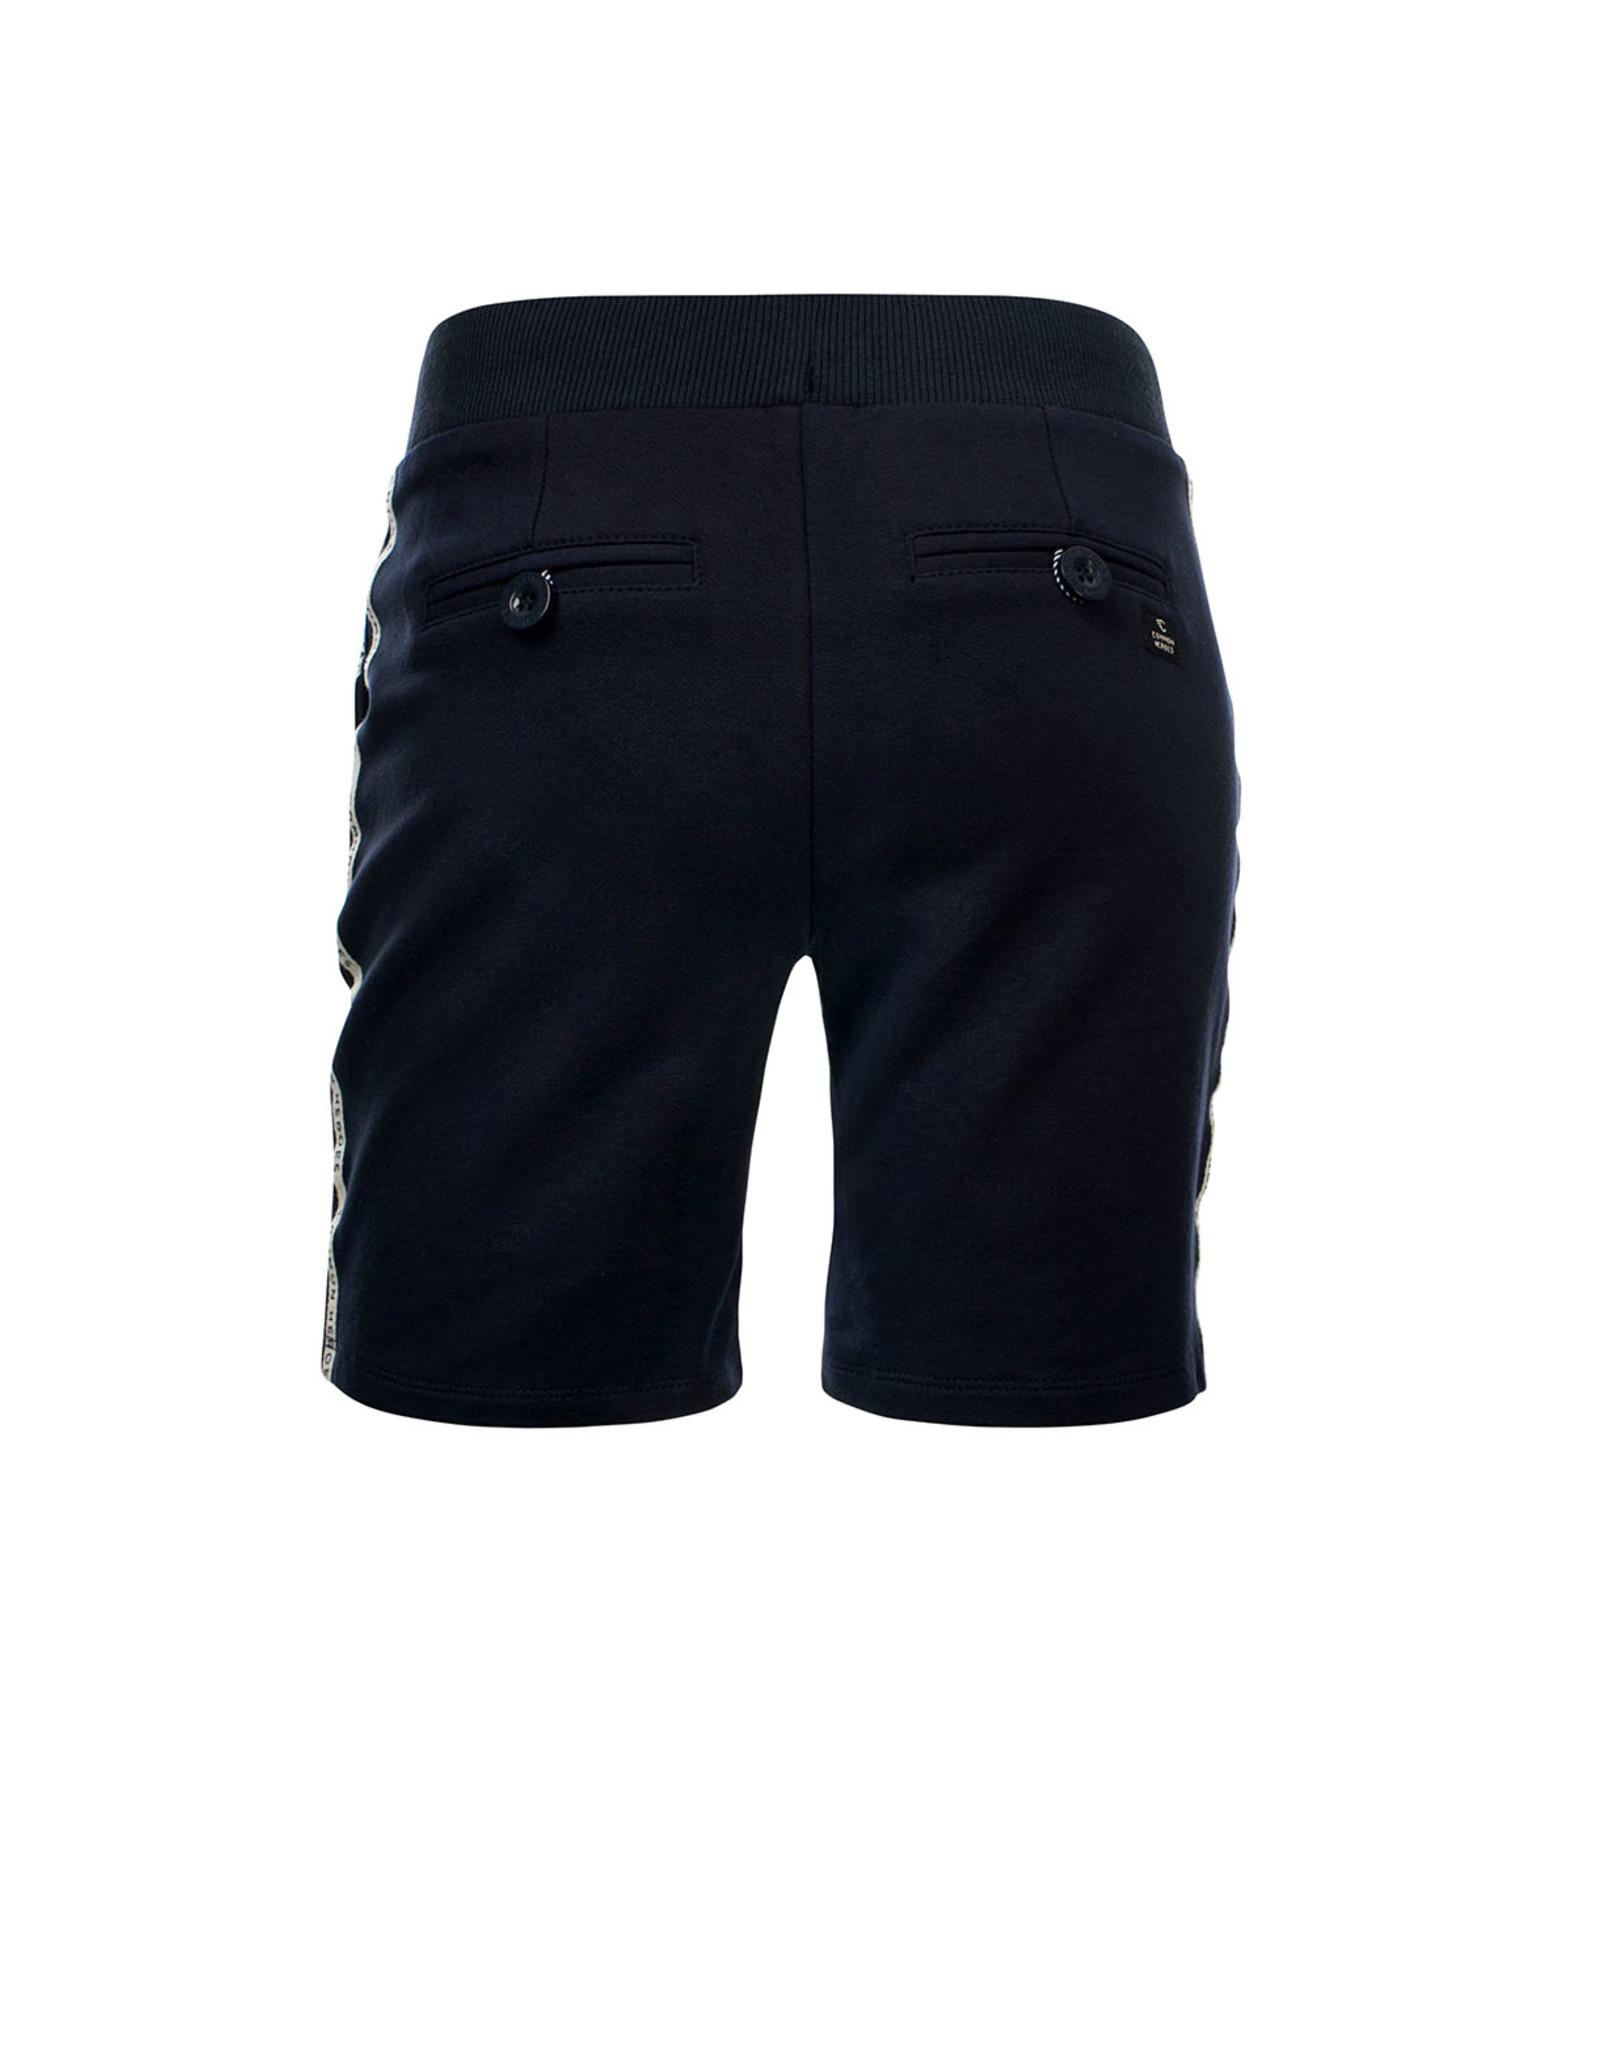 Common Heroes BO sweat shorts with lycra Marine